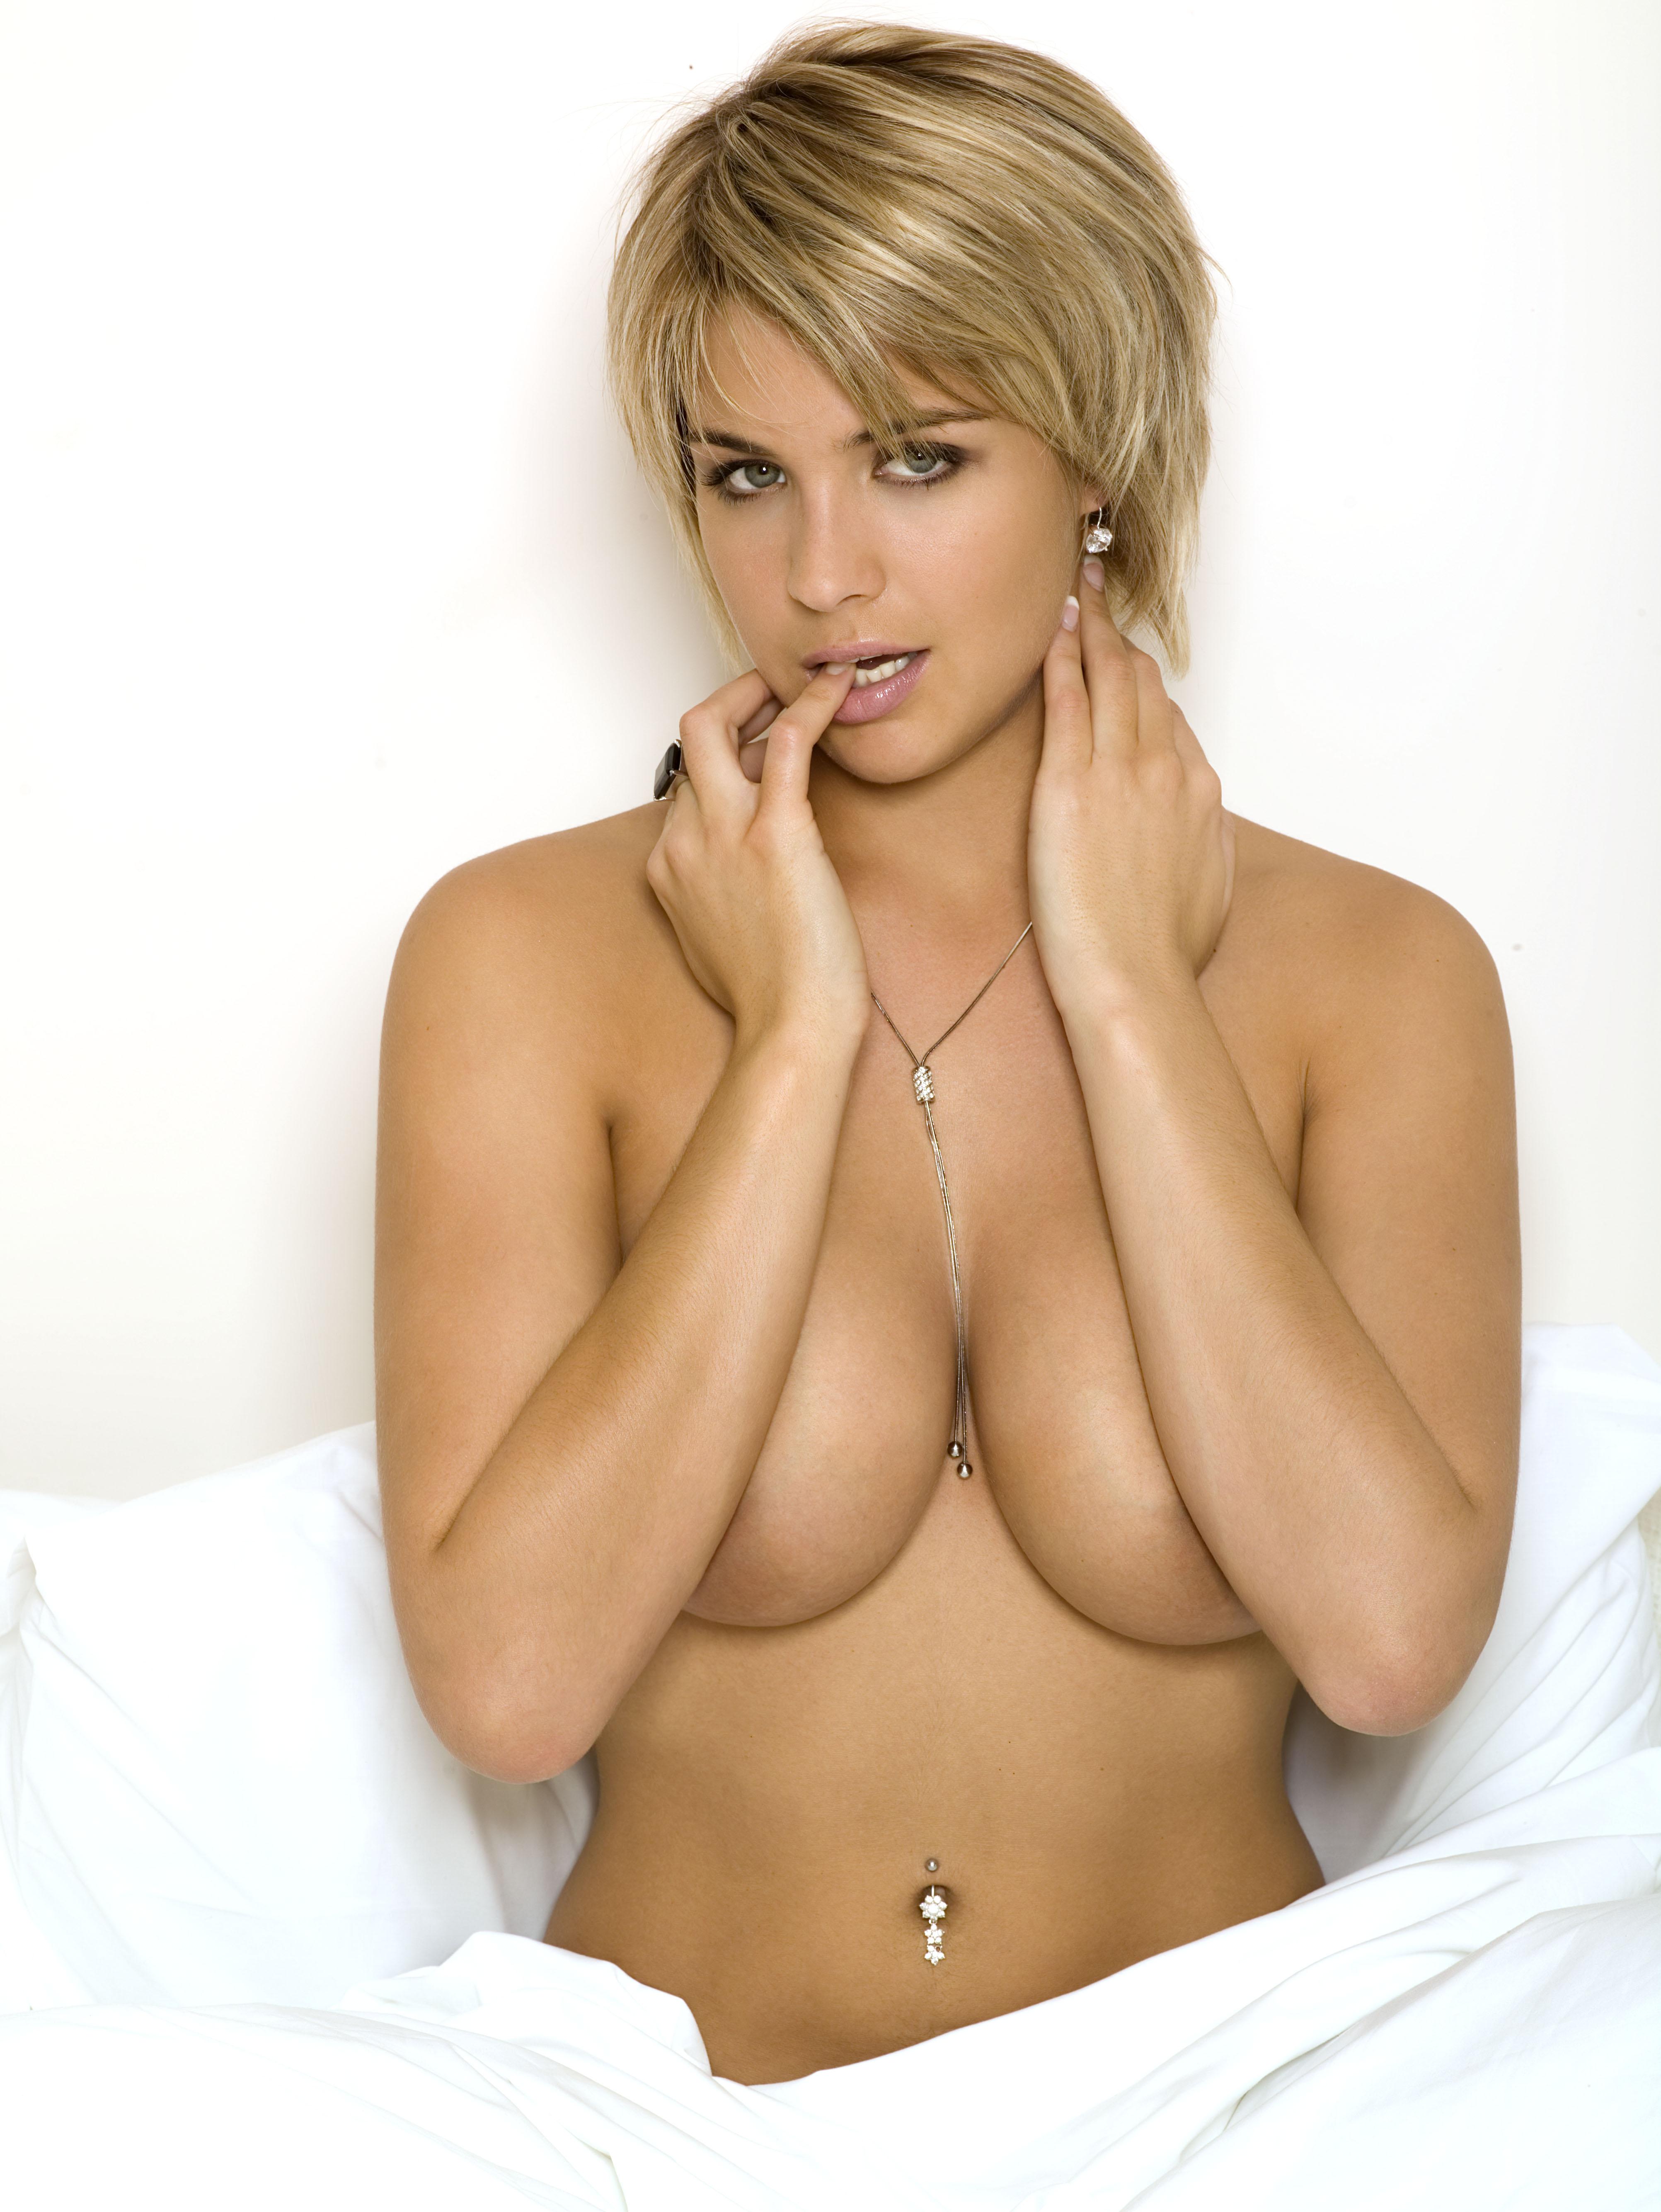 Джемма аткинсон фото голая